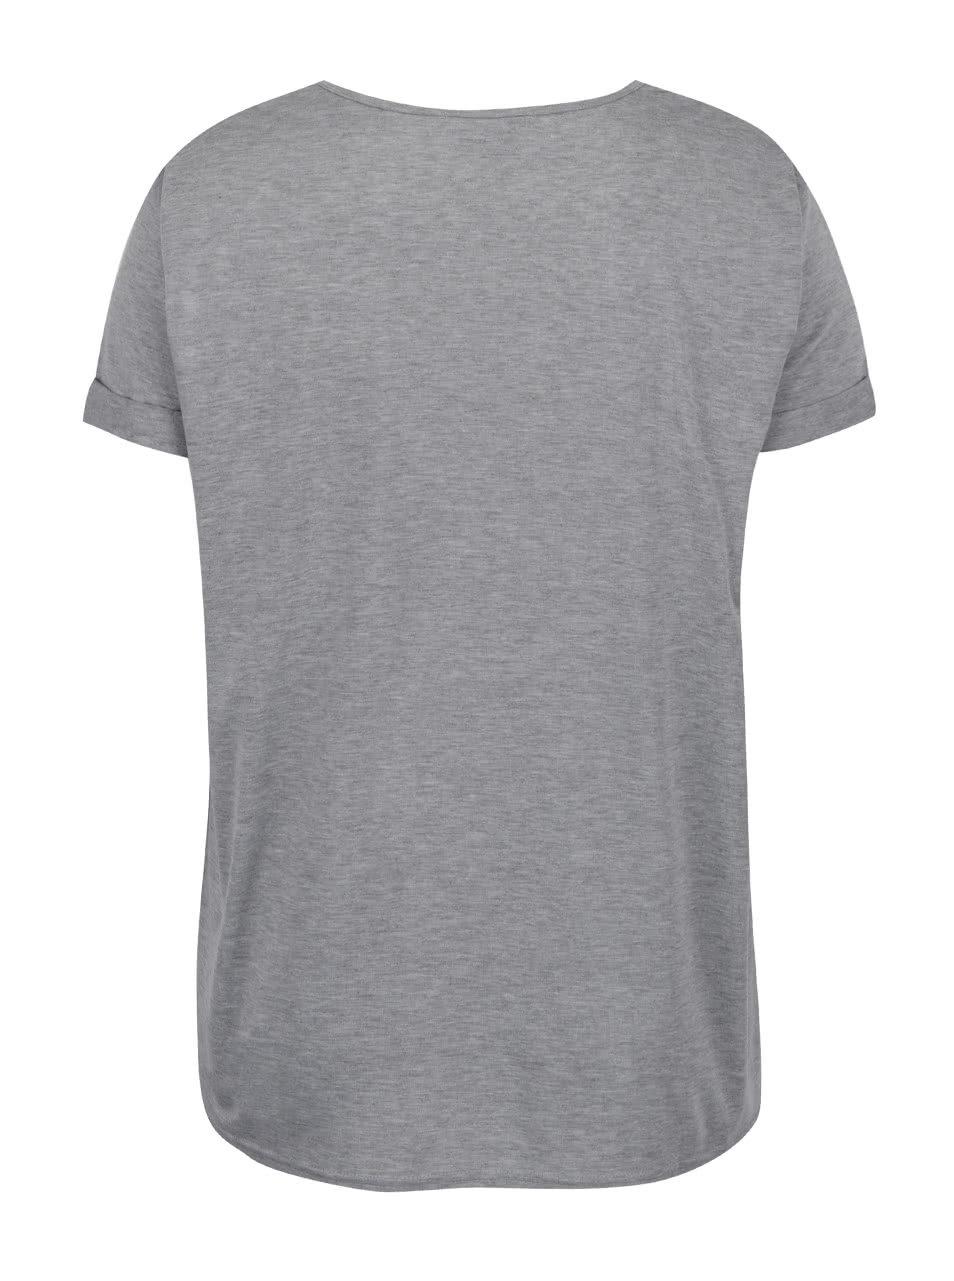 59341feaff39 Šedé tričko s potiskem Dorothy Perkins Curve ...